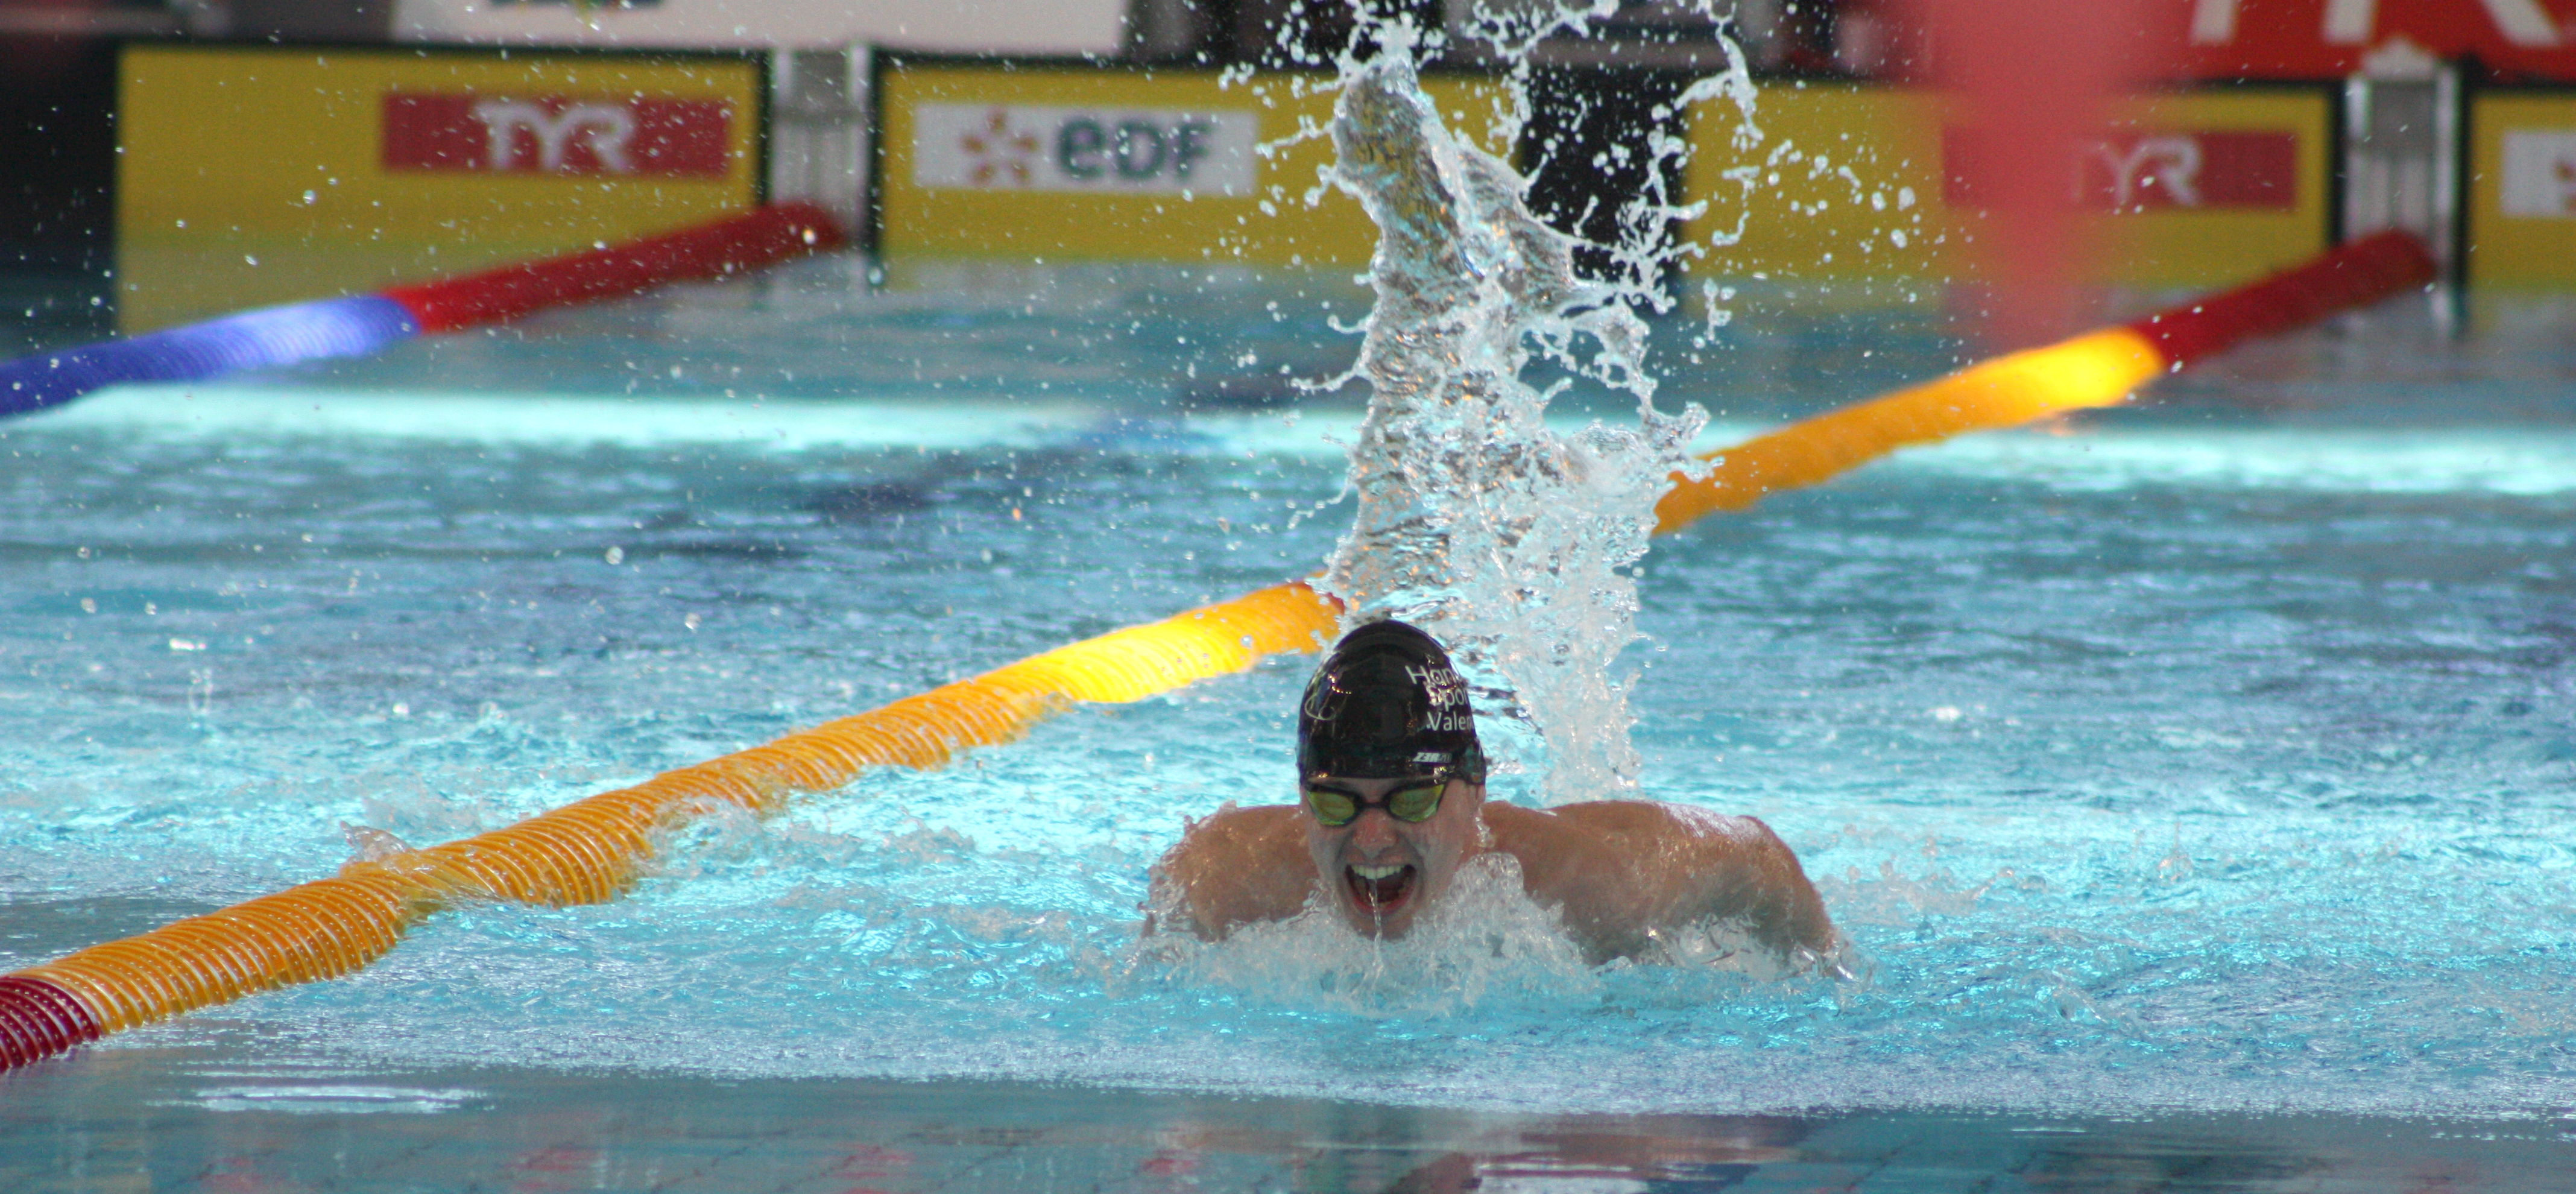 Yohan Mahistre, sportif de haut niveau